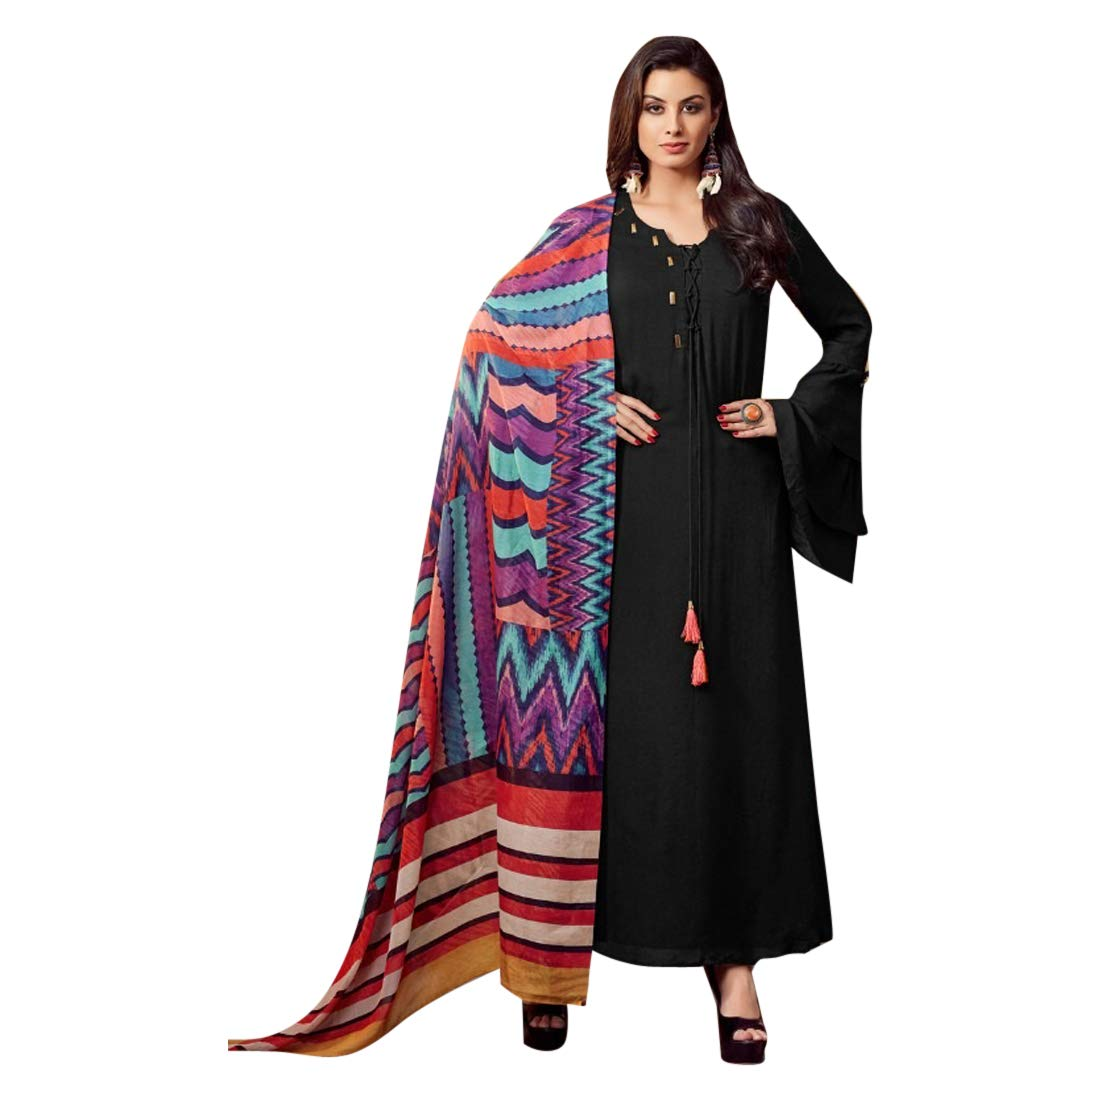 Black Indian Designer Silk Kurti with Printed Dupatta for Women Formal Kurta Festive wear 7519